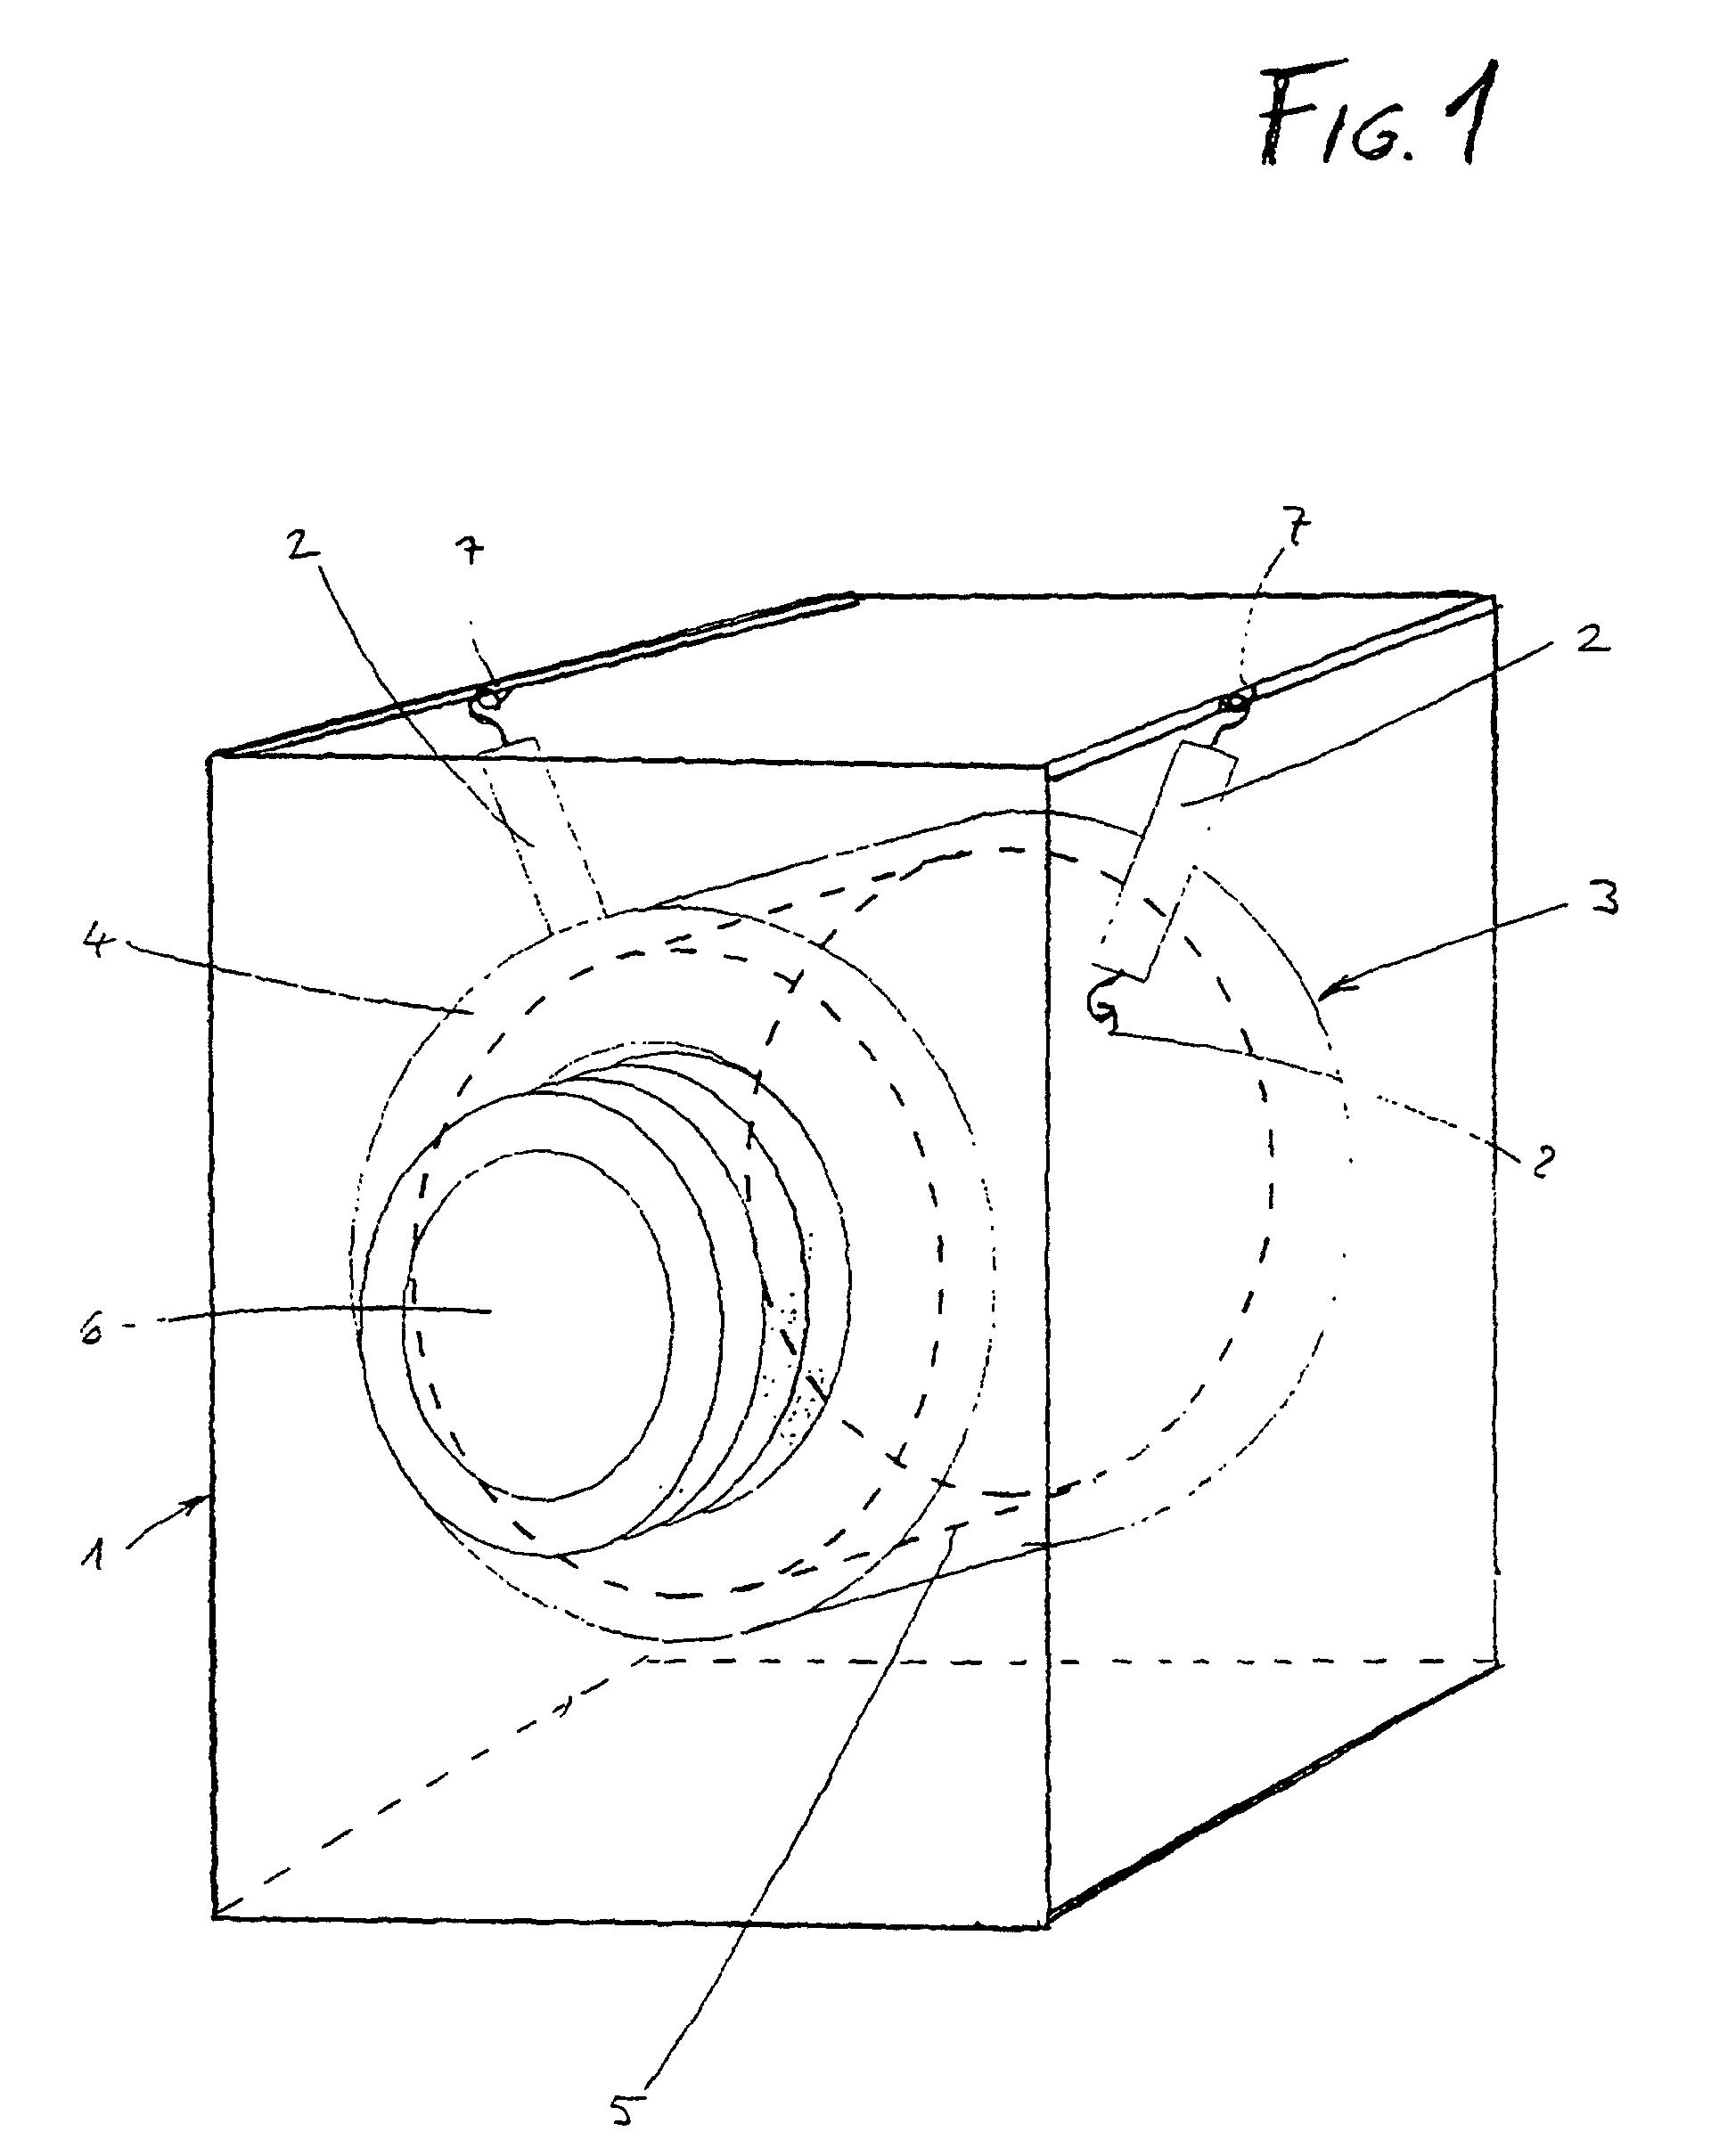 Washing Machine Drawing ~ Patent ep b washing machine with improved